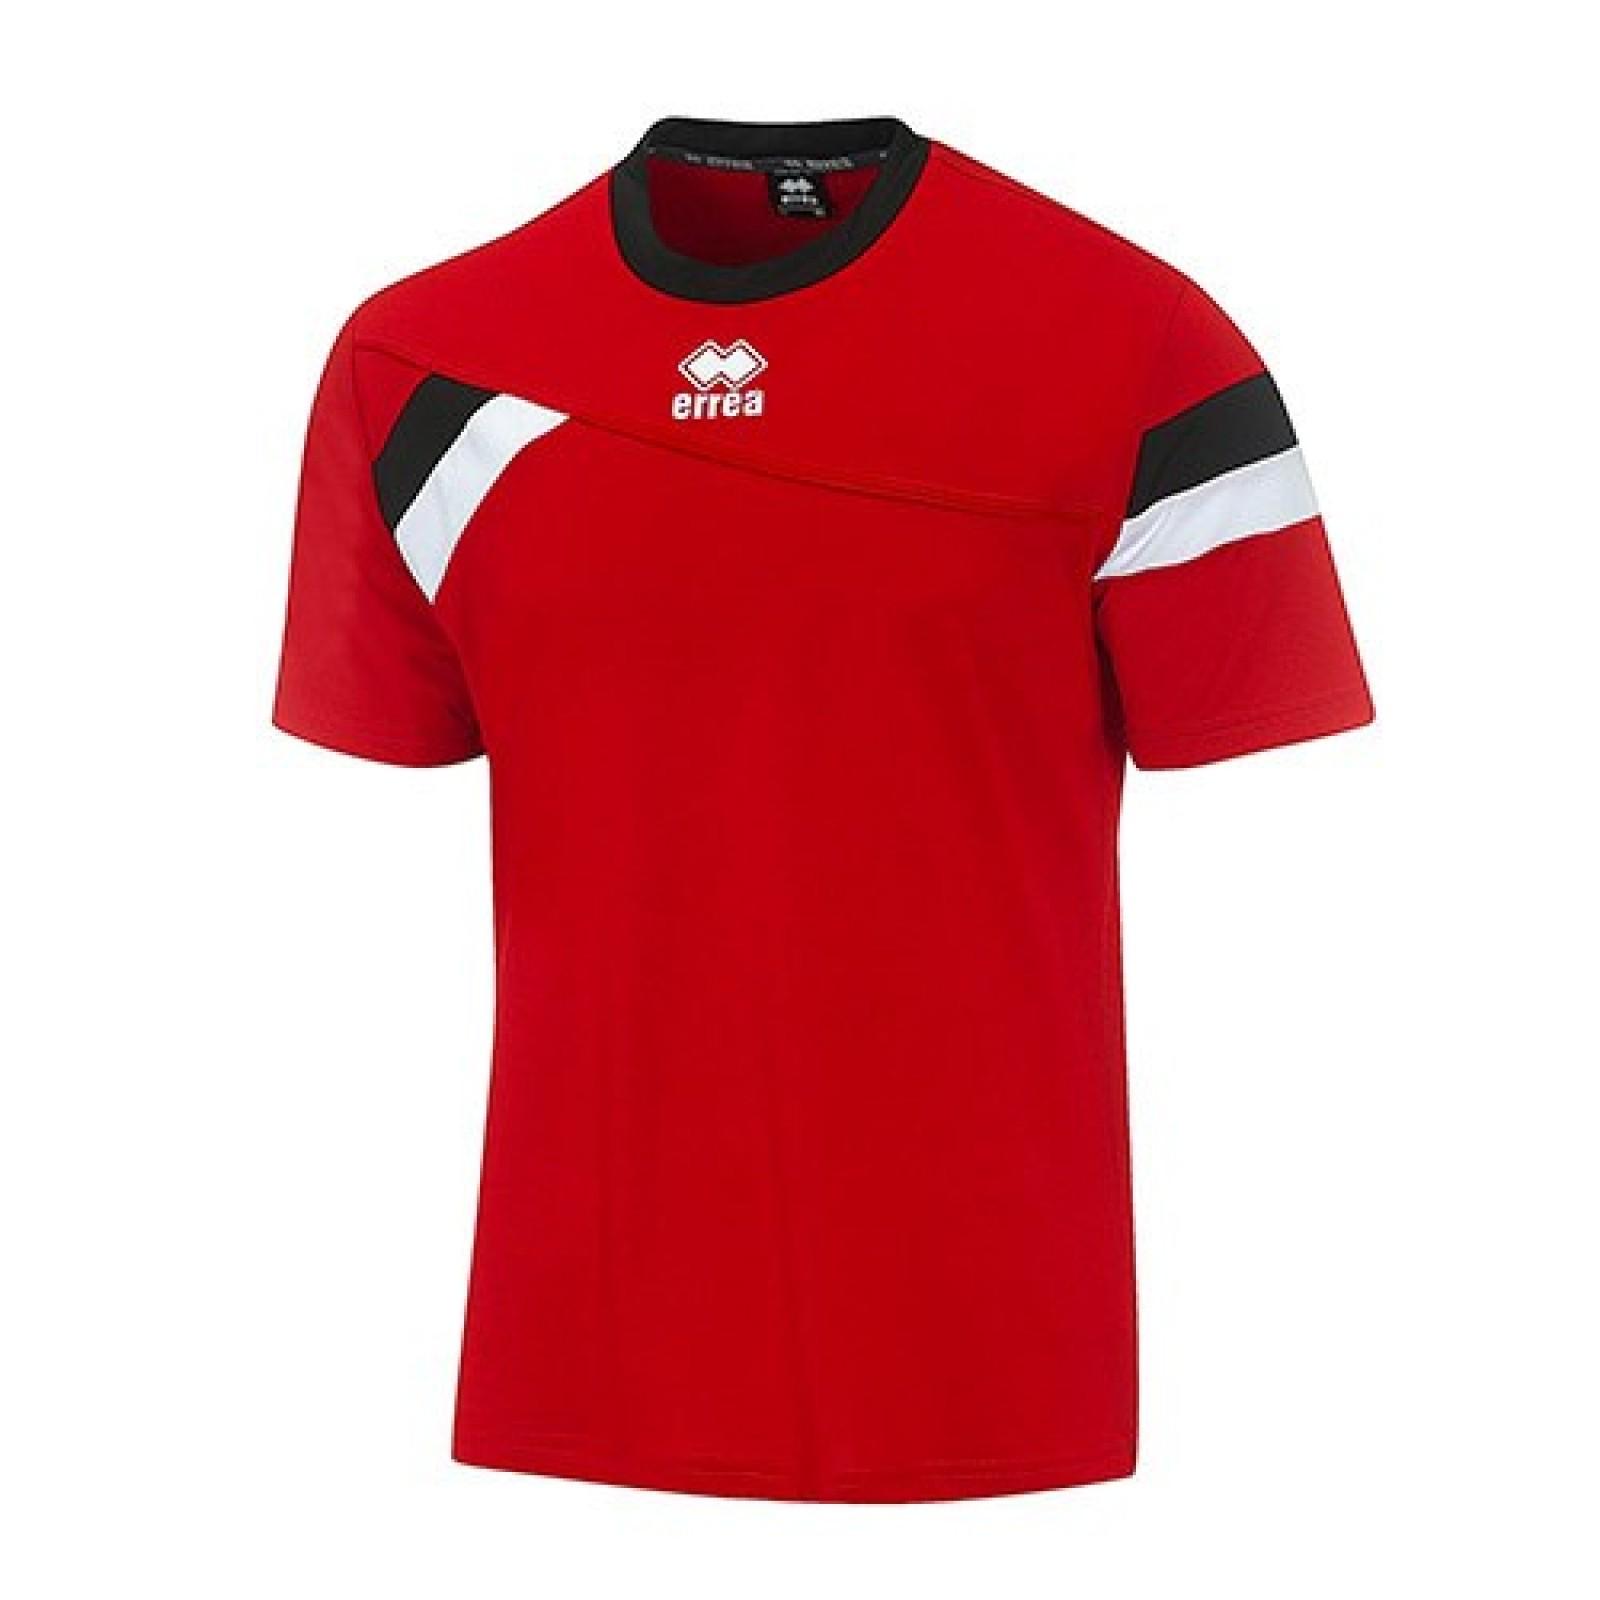 Errea Falkland Short Sleeve Shirt